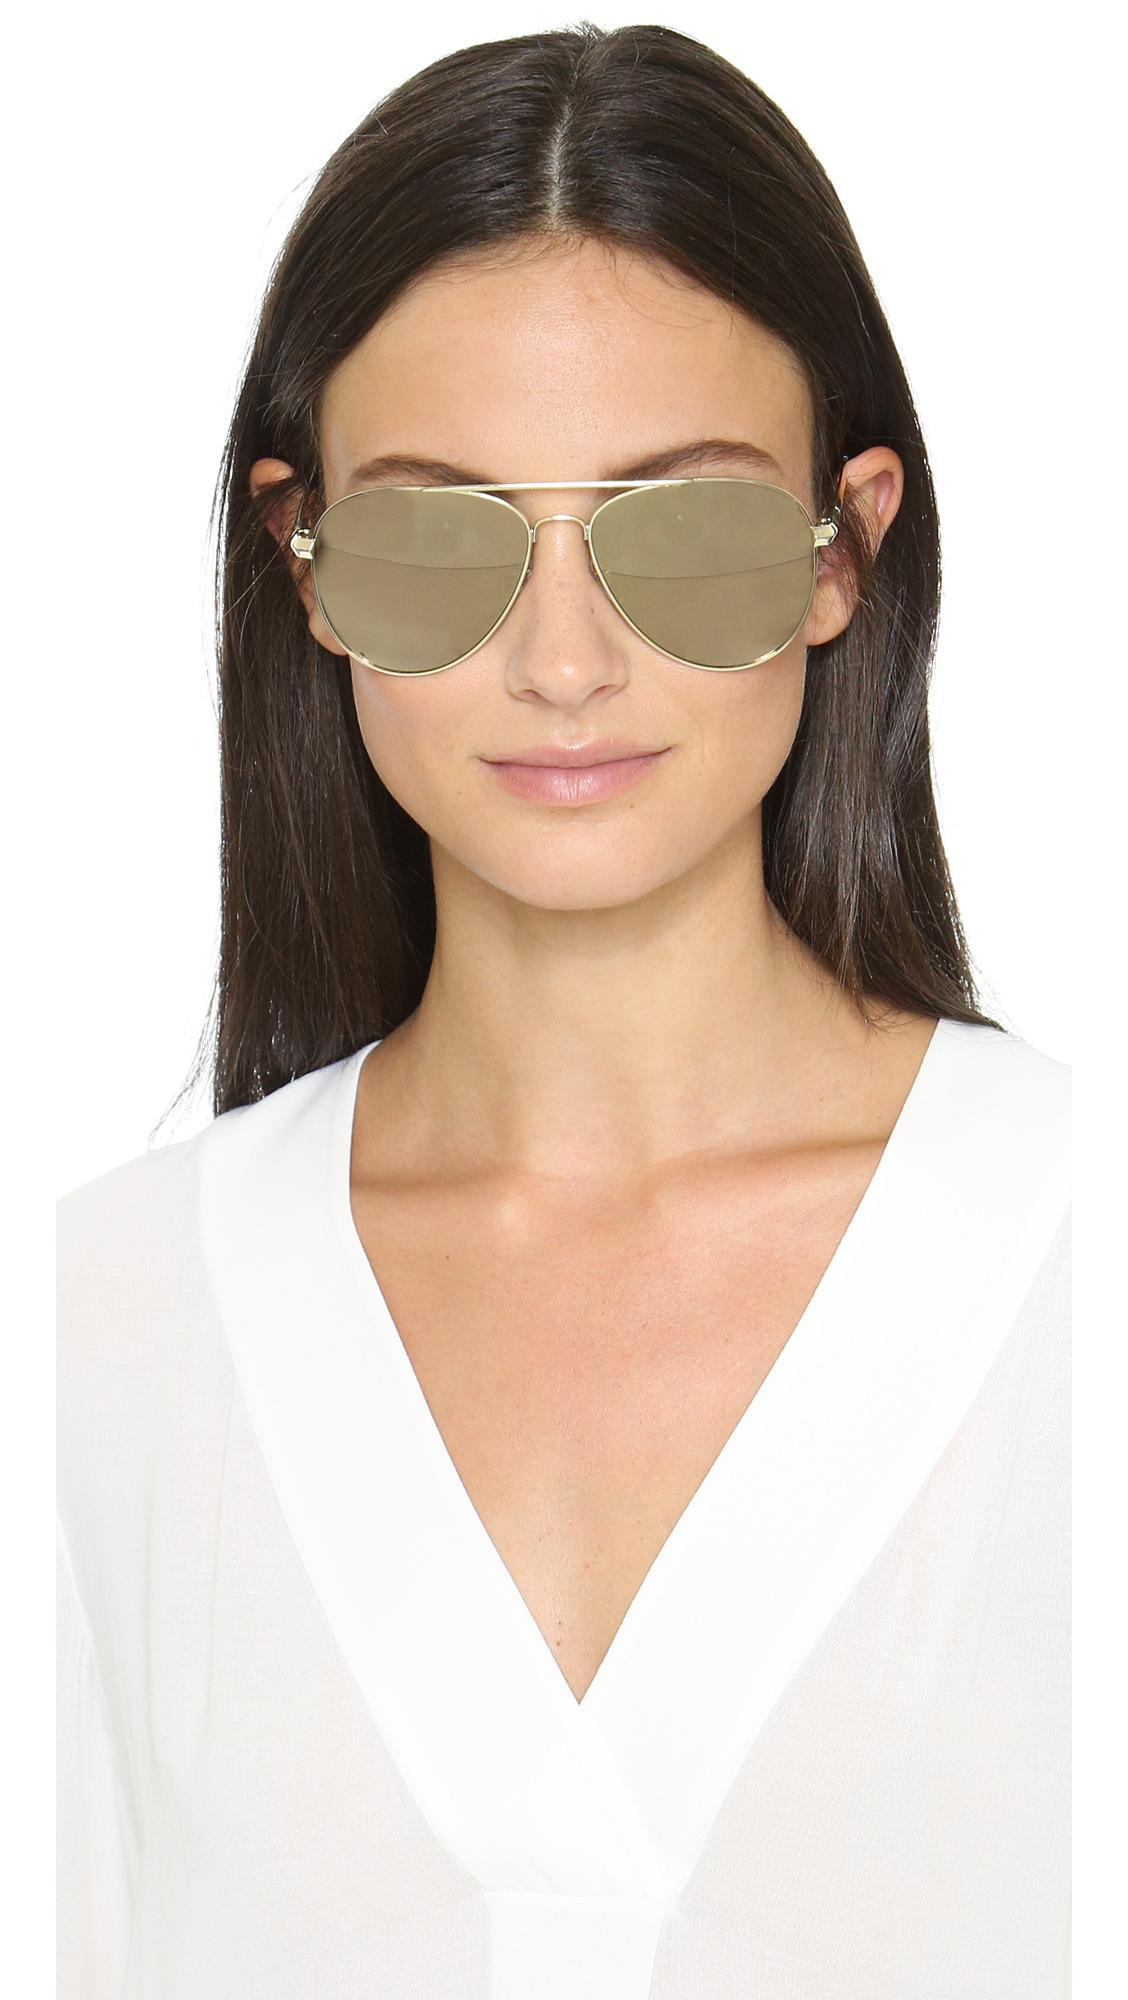 Drop Le Top Sunglasses Metallic Specs OXwkP08n